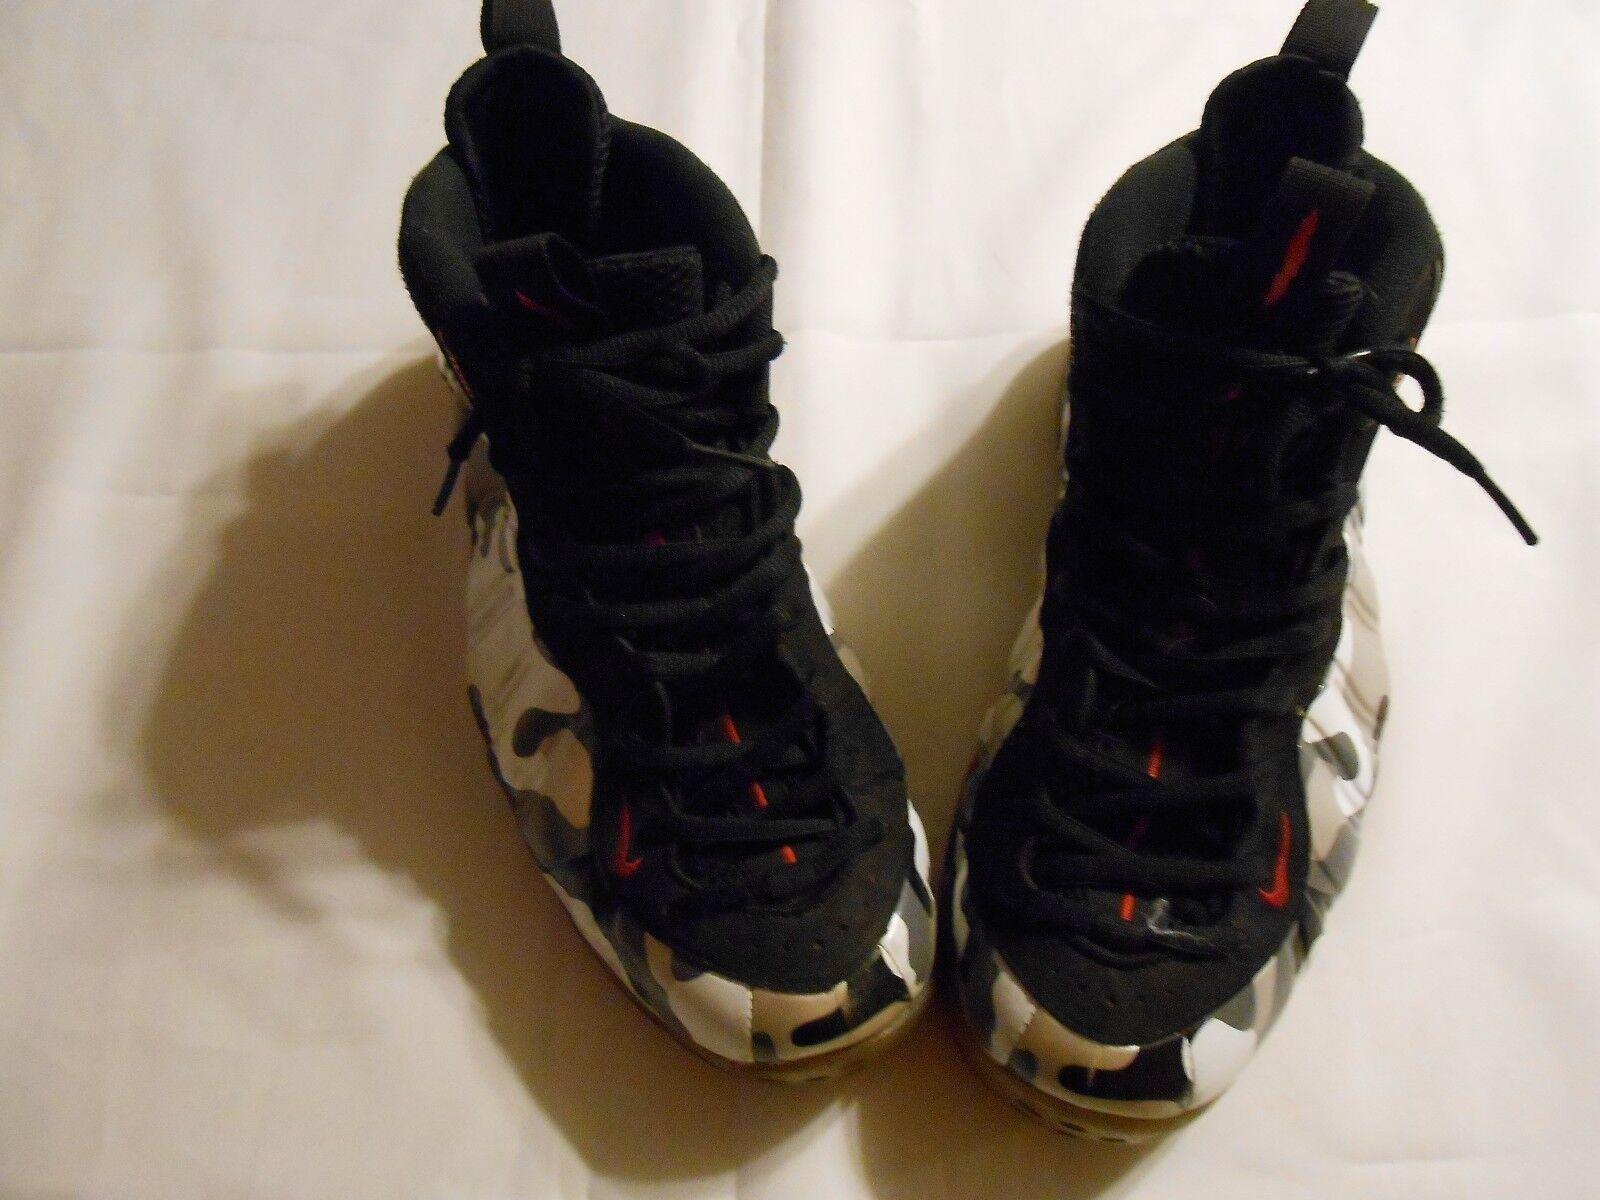 Nike jet air foamposite un premio jet Nike mimetico Uomo le scarpe!!!11!!! 3ab1c1